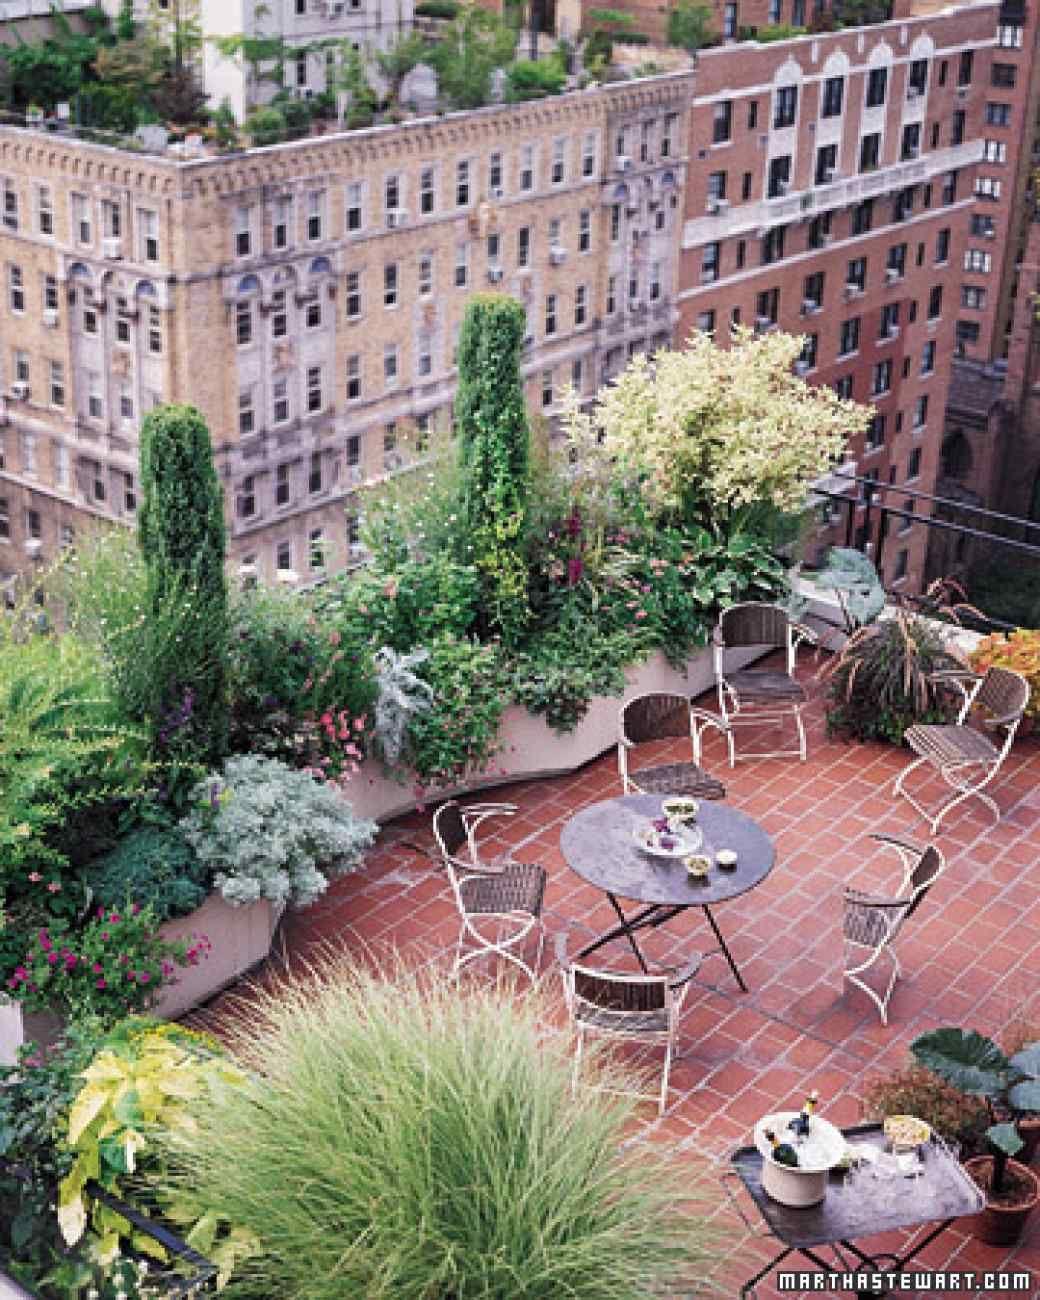 Simple Terrace Garden: Container Garden Ideas For Any Household